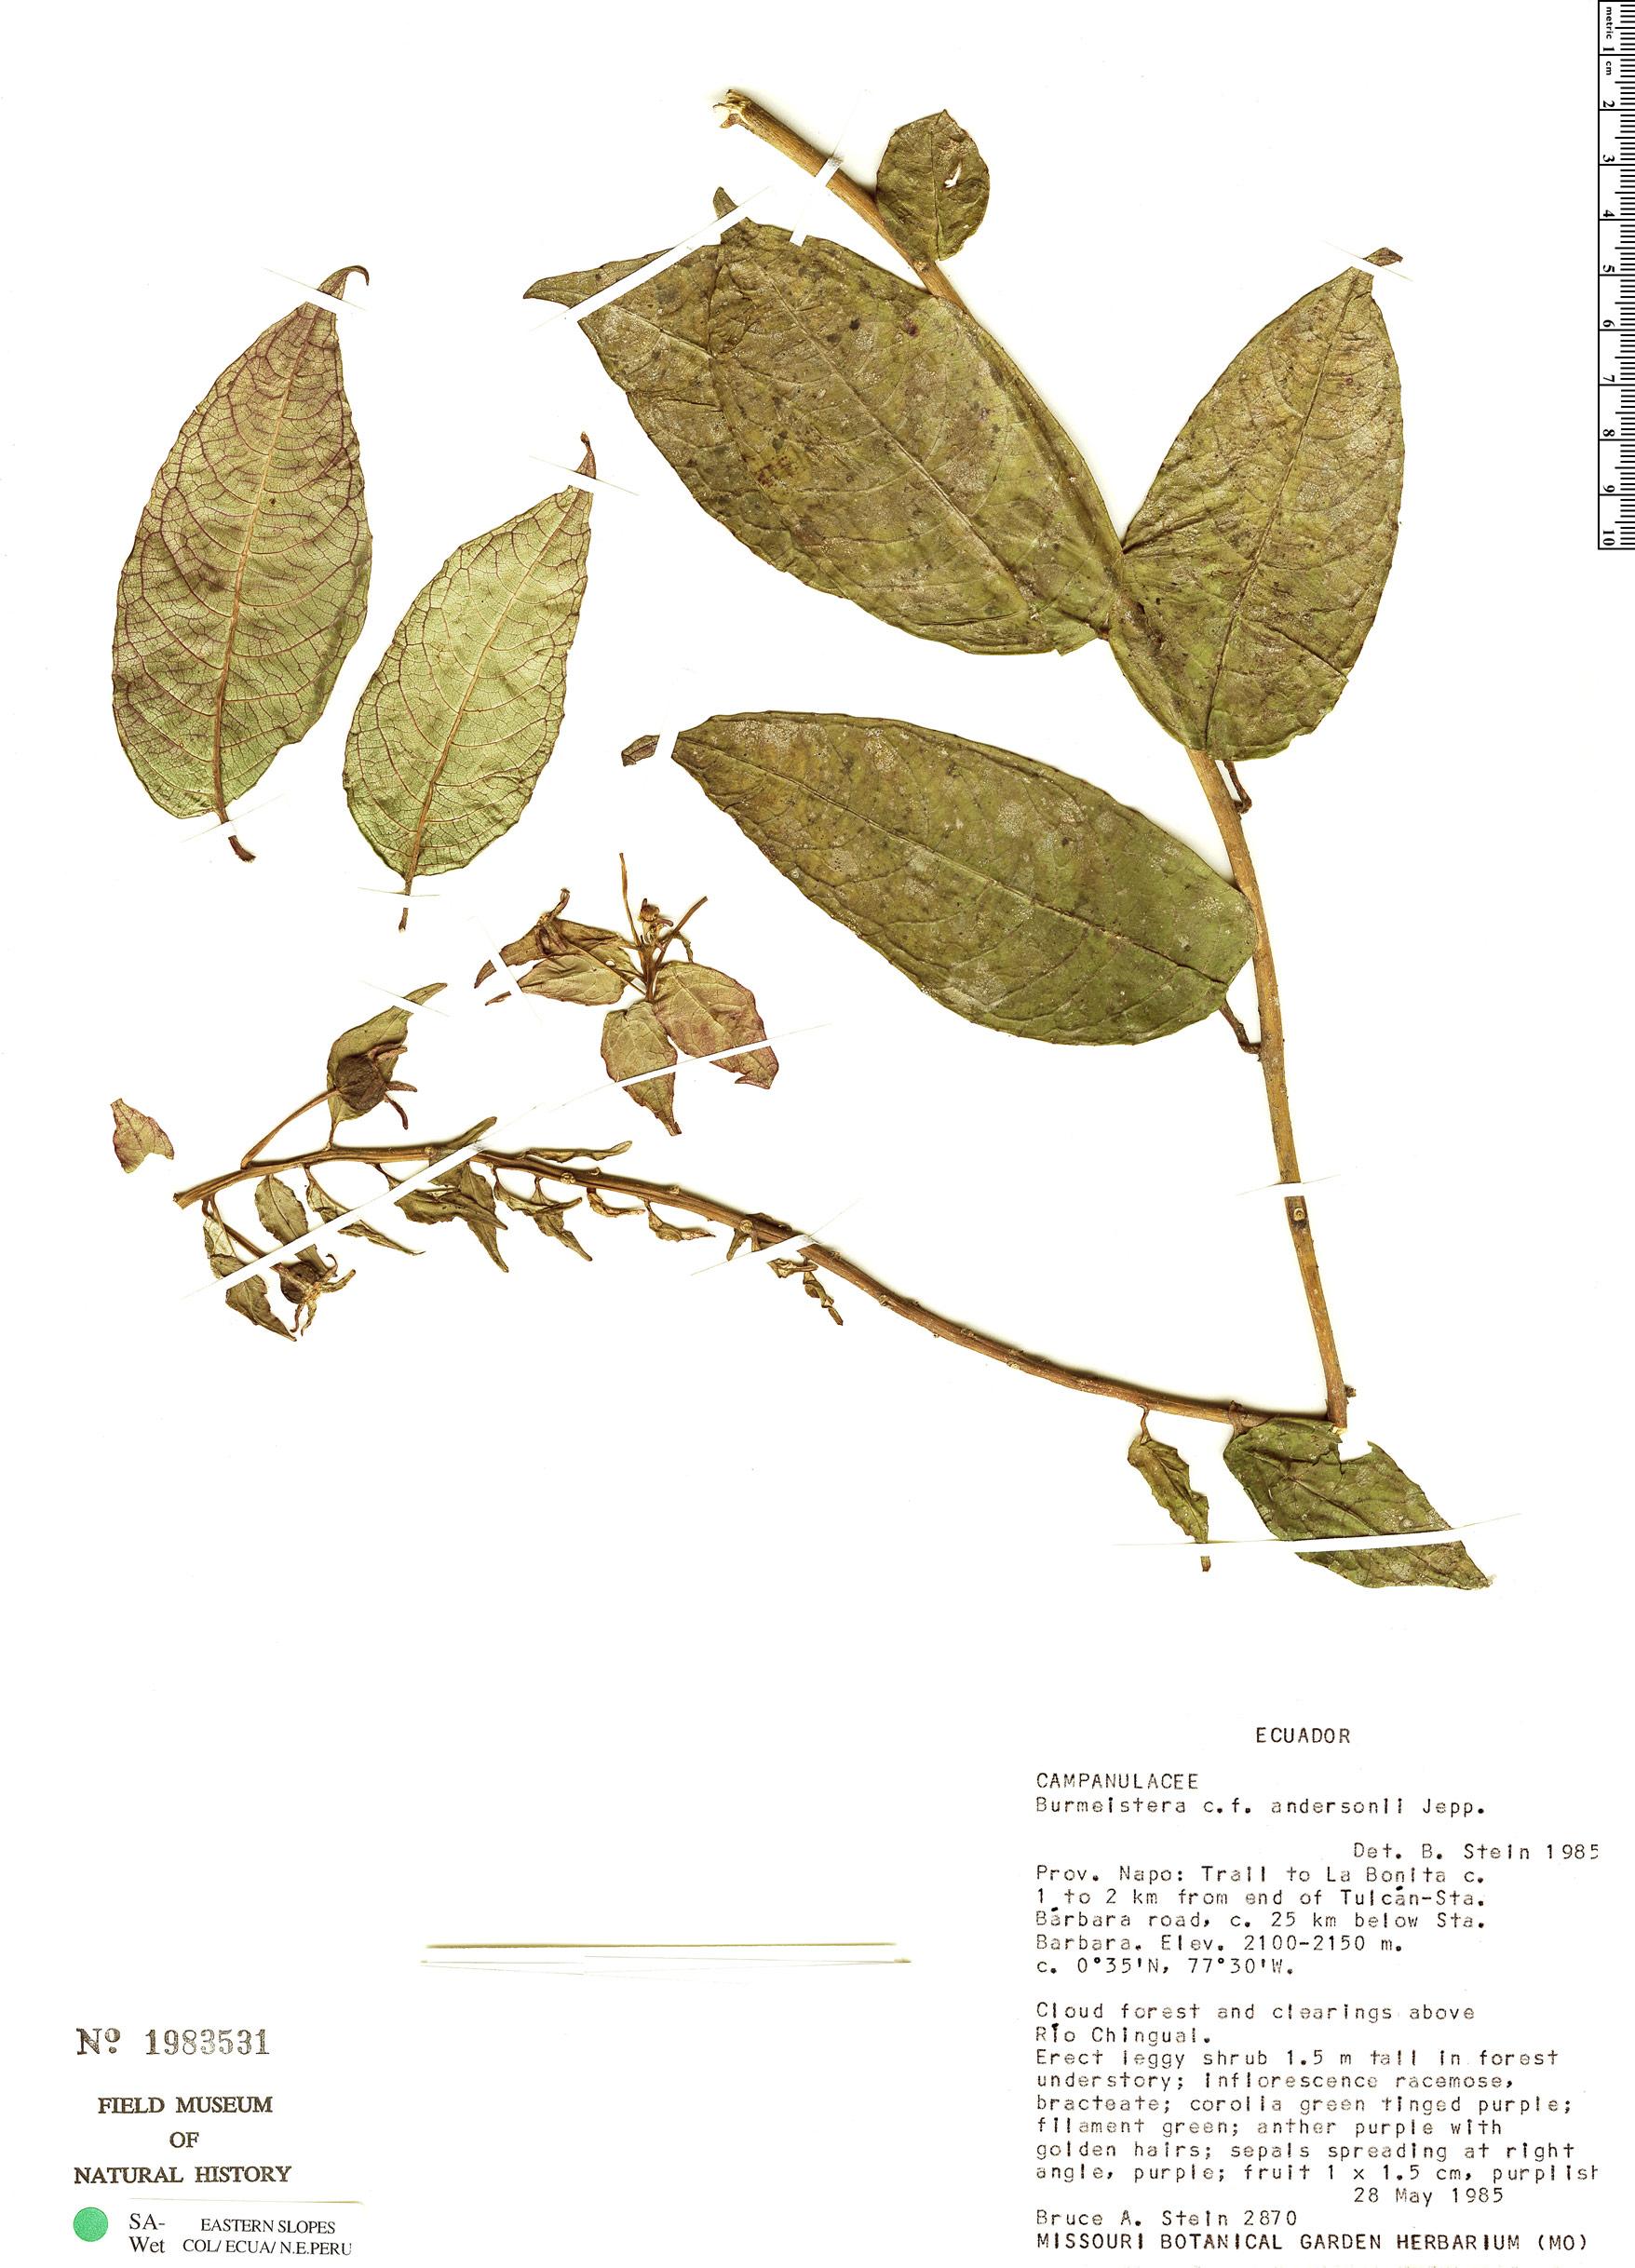 Specimen: Burmeistera anderssonii